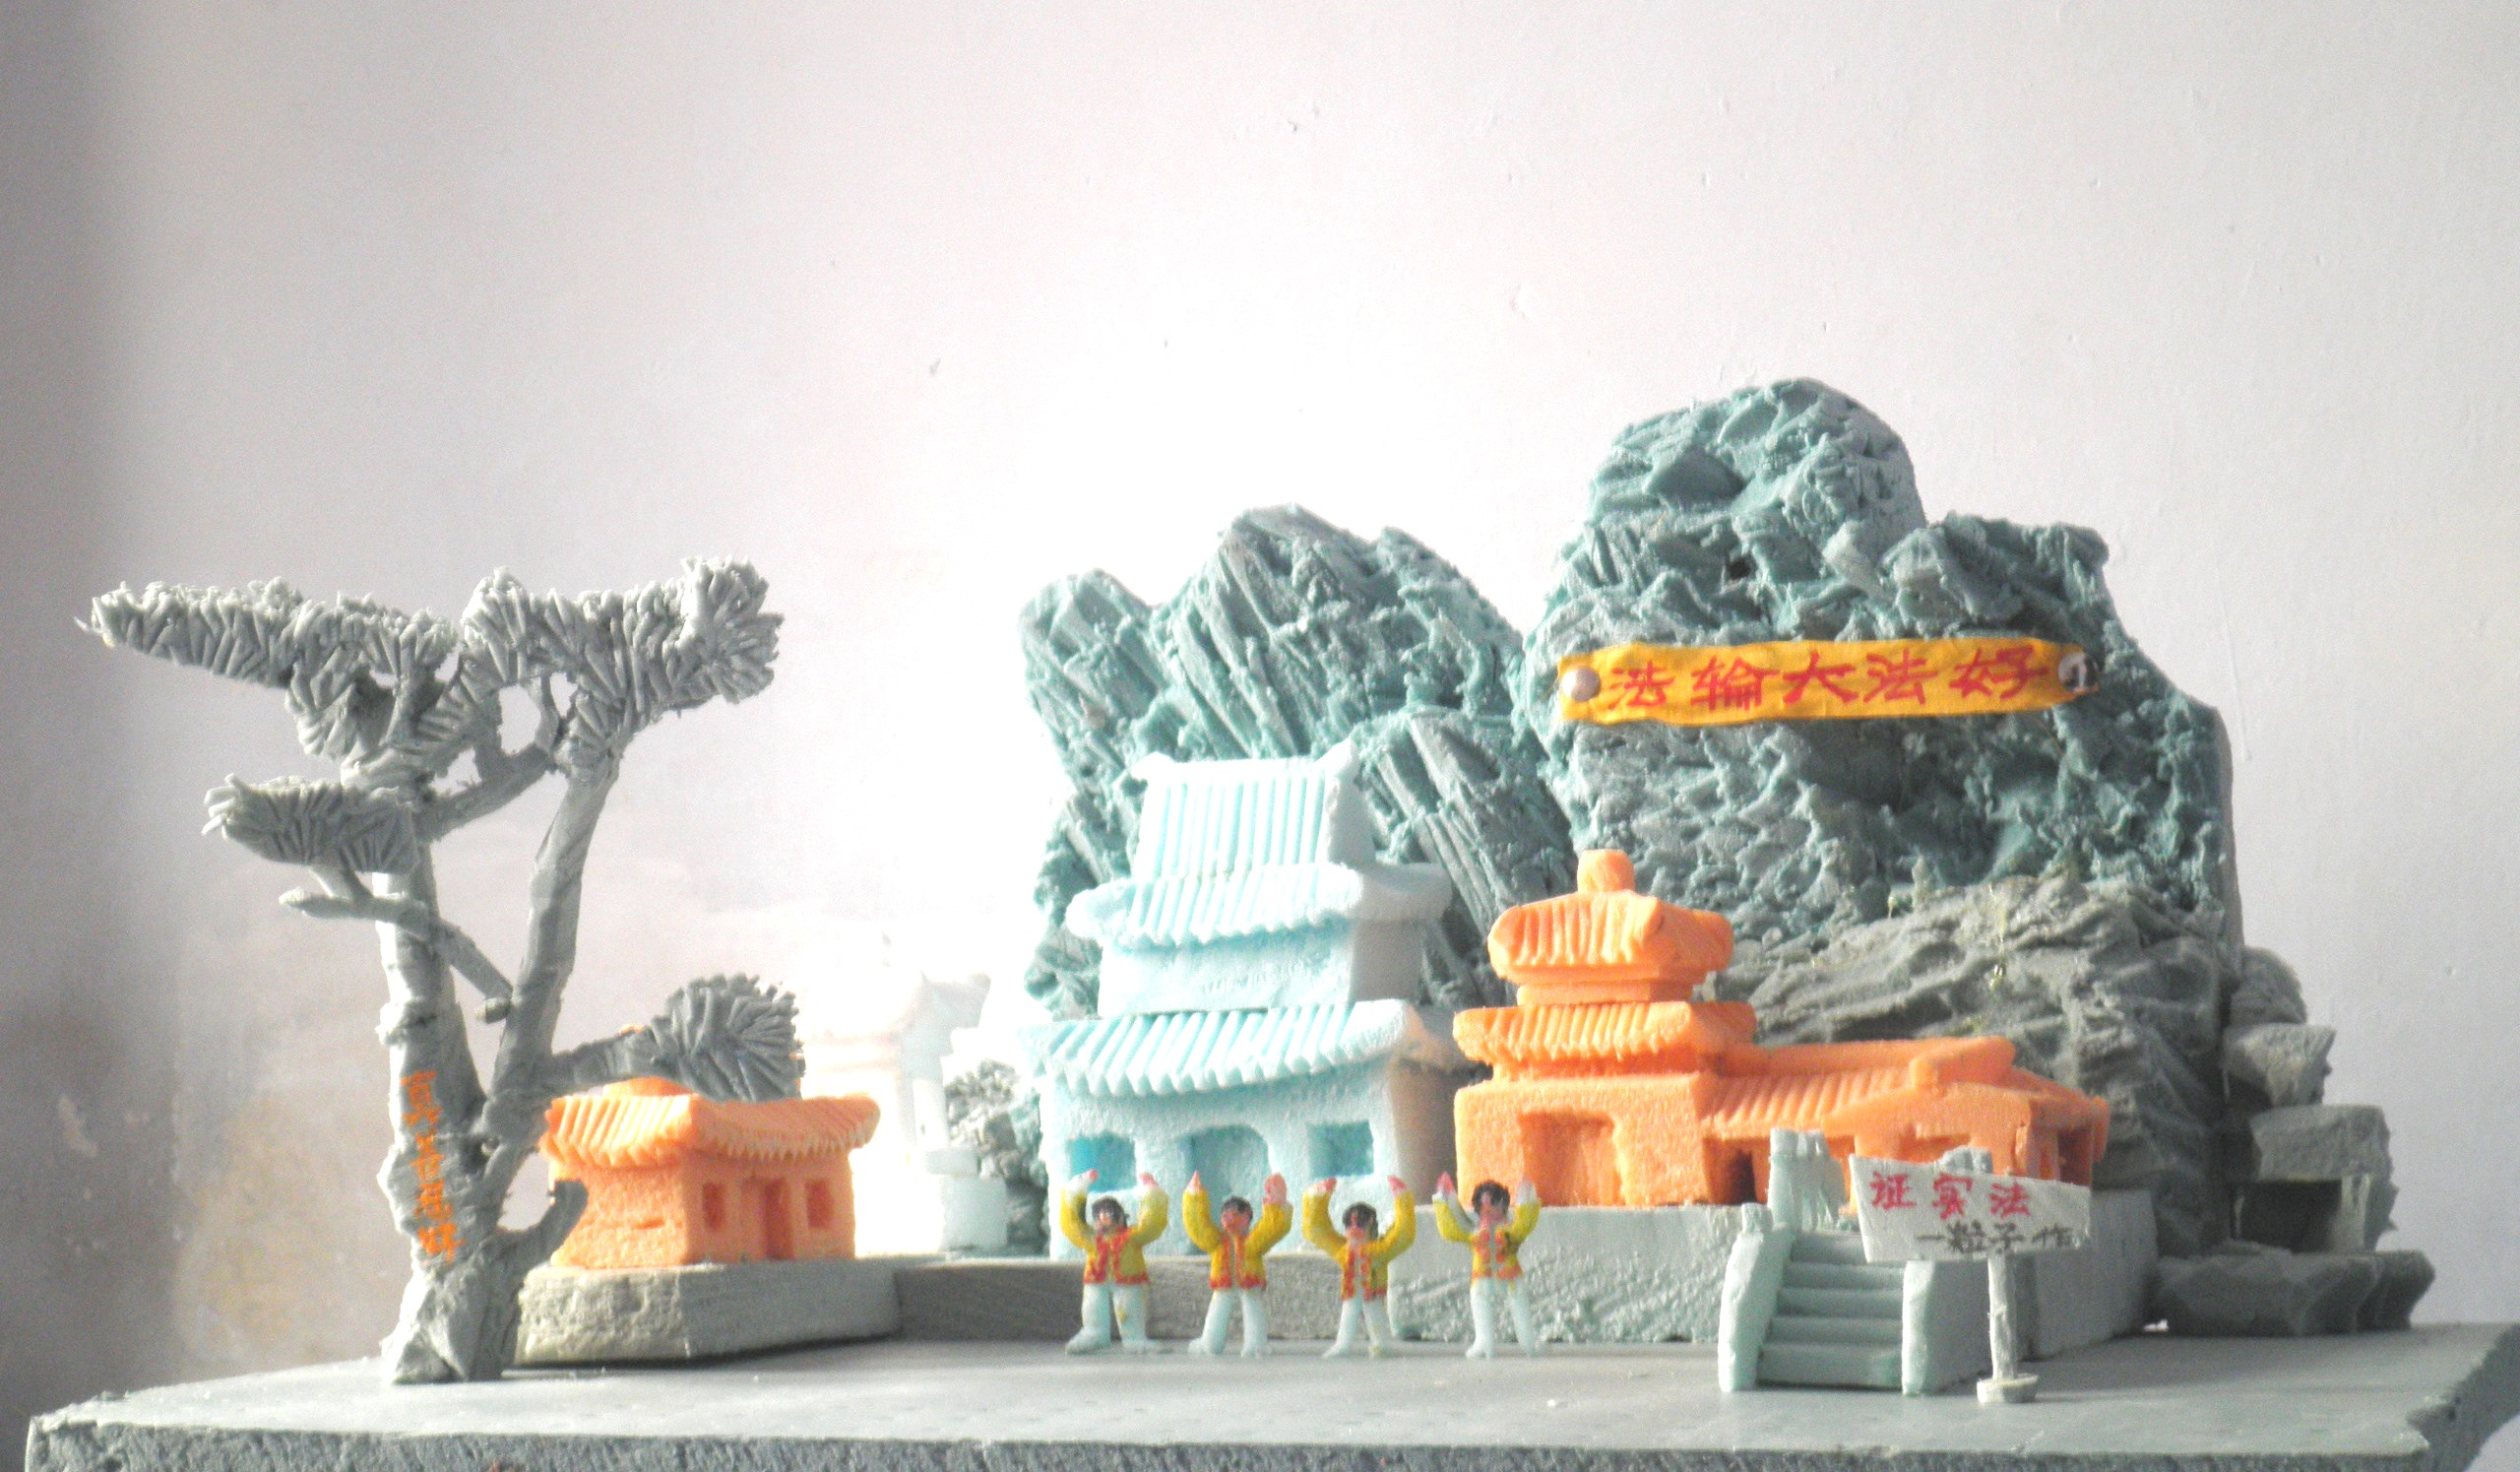 Celebrating world falun dafa day] carved rigid foam insulation board